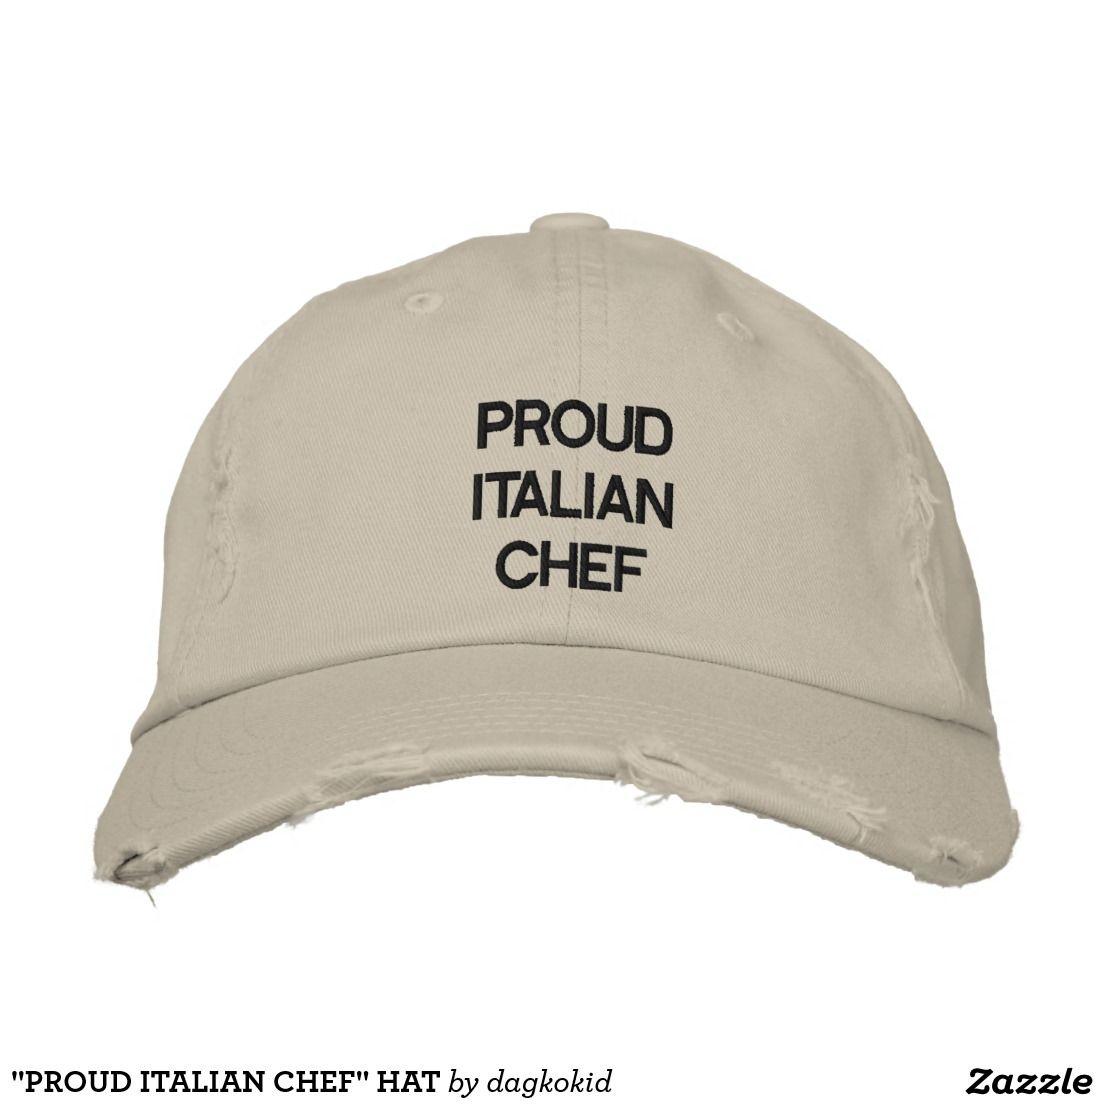 4f7d86b0cca proud italian chef